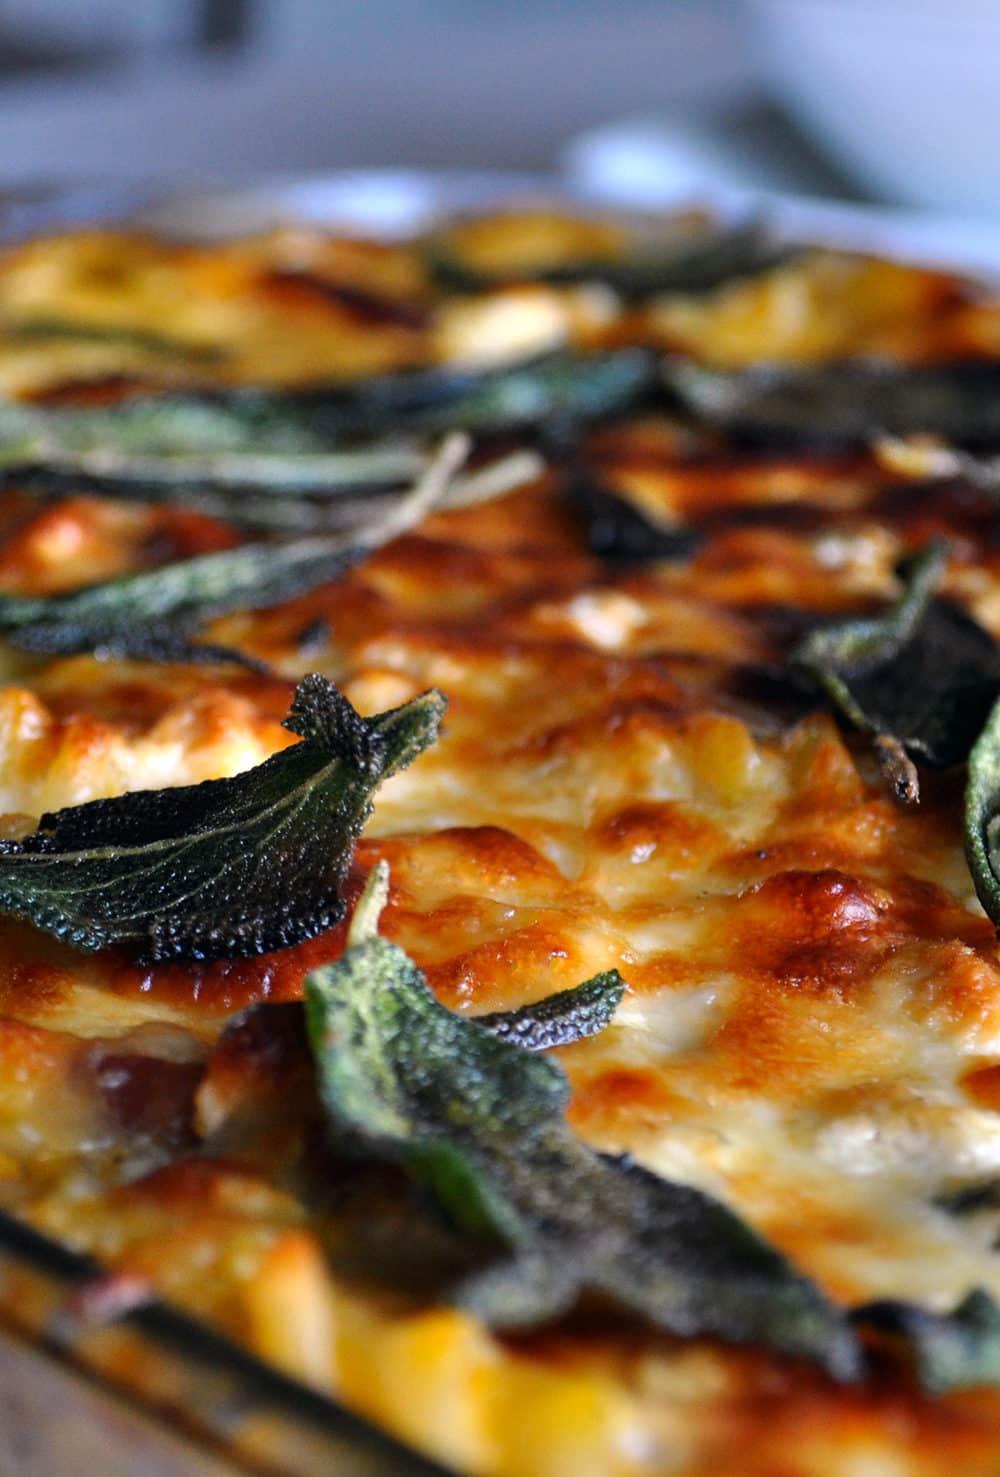 Gluten Free Butternut Squash Pasta with Gorgonzola, Bacon and Sage | ofbatteranddough.com